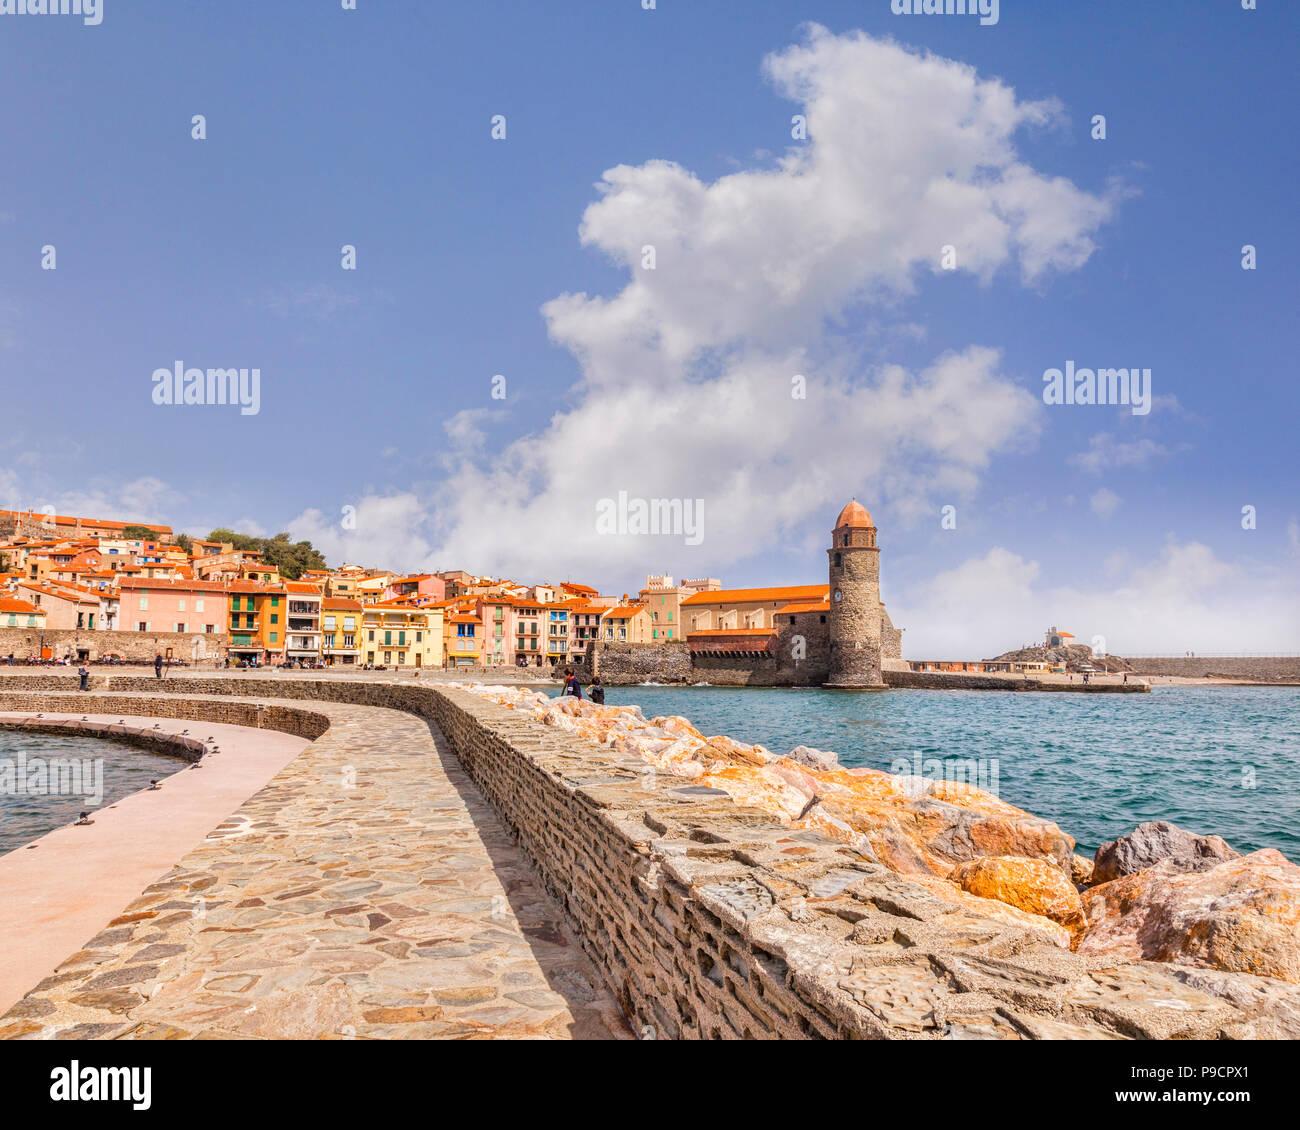 Port-vendres, Languedoc-Roussillon, Pyrenees-Orientales, Frankreich. Stockfoto